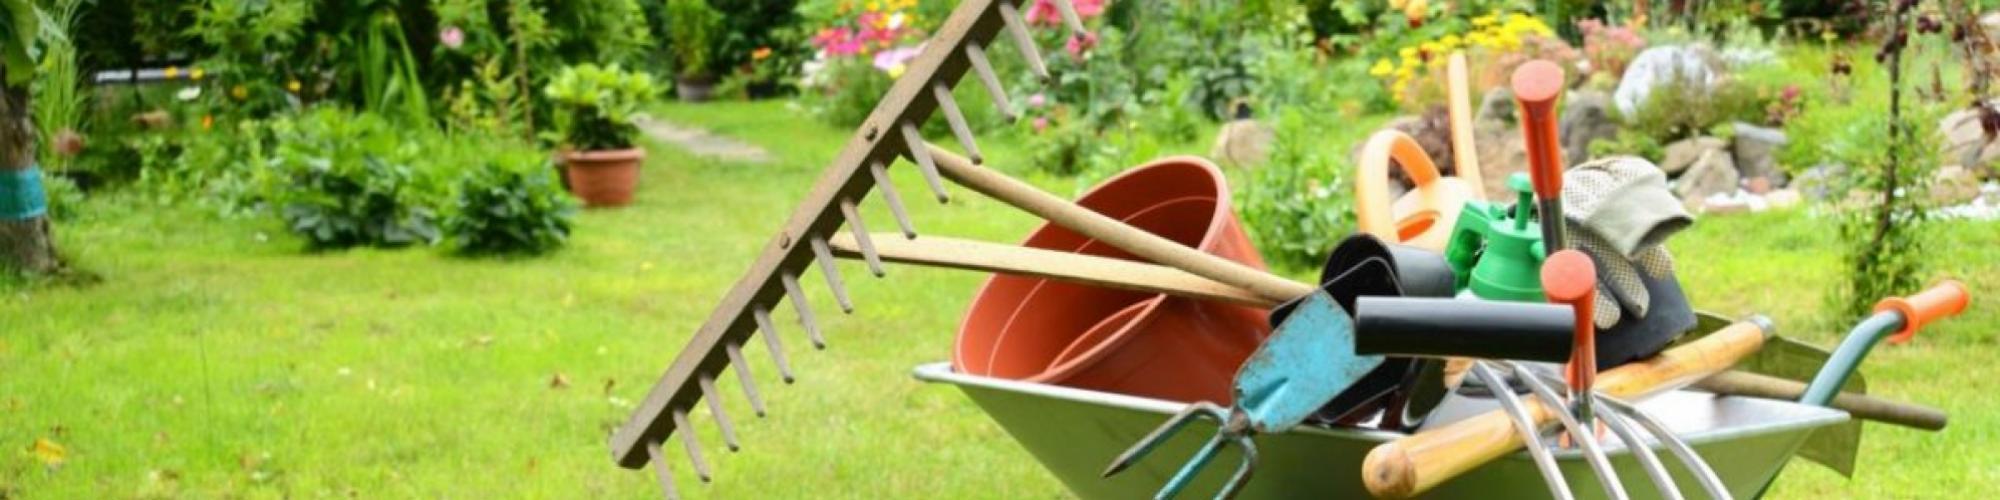 attrezzi e macchinari da giardino